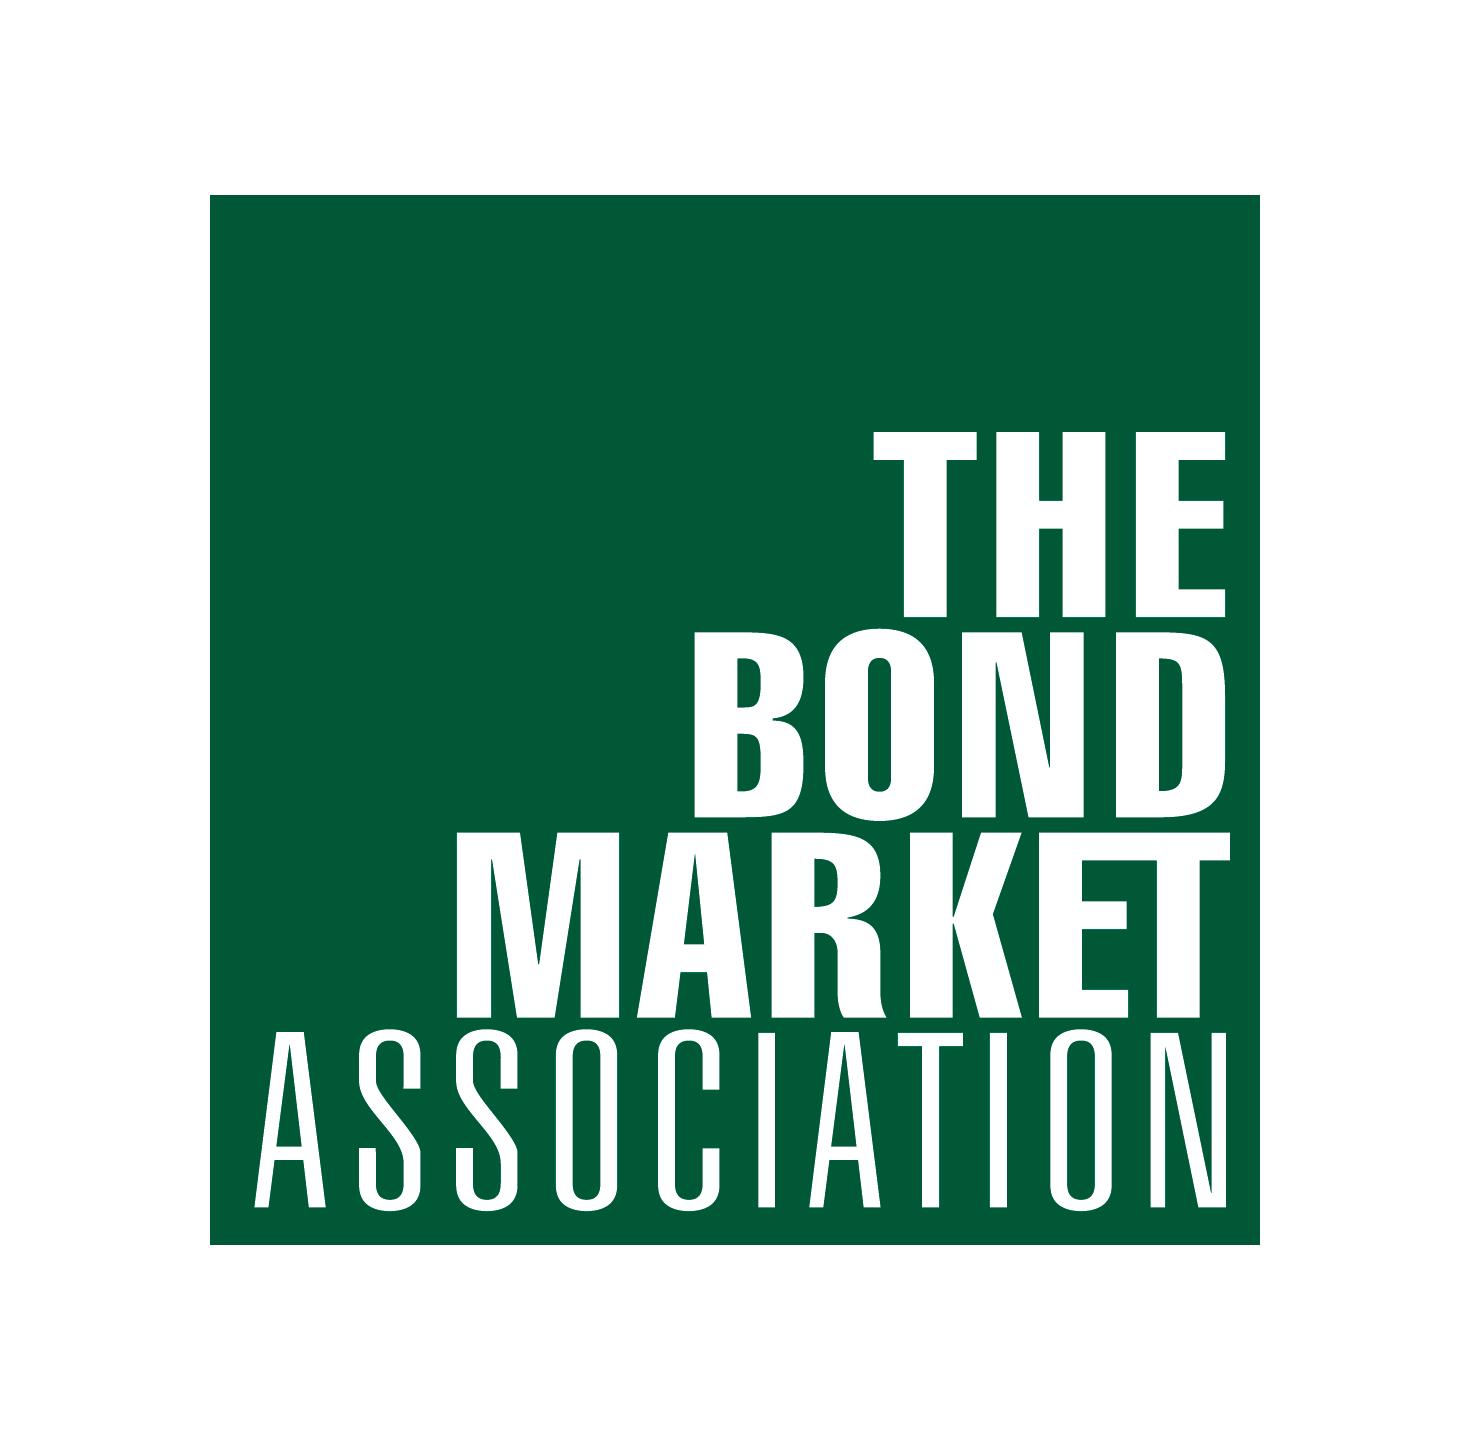 Project image 1 for Identity, Bond Market Association